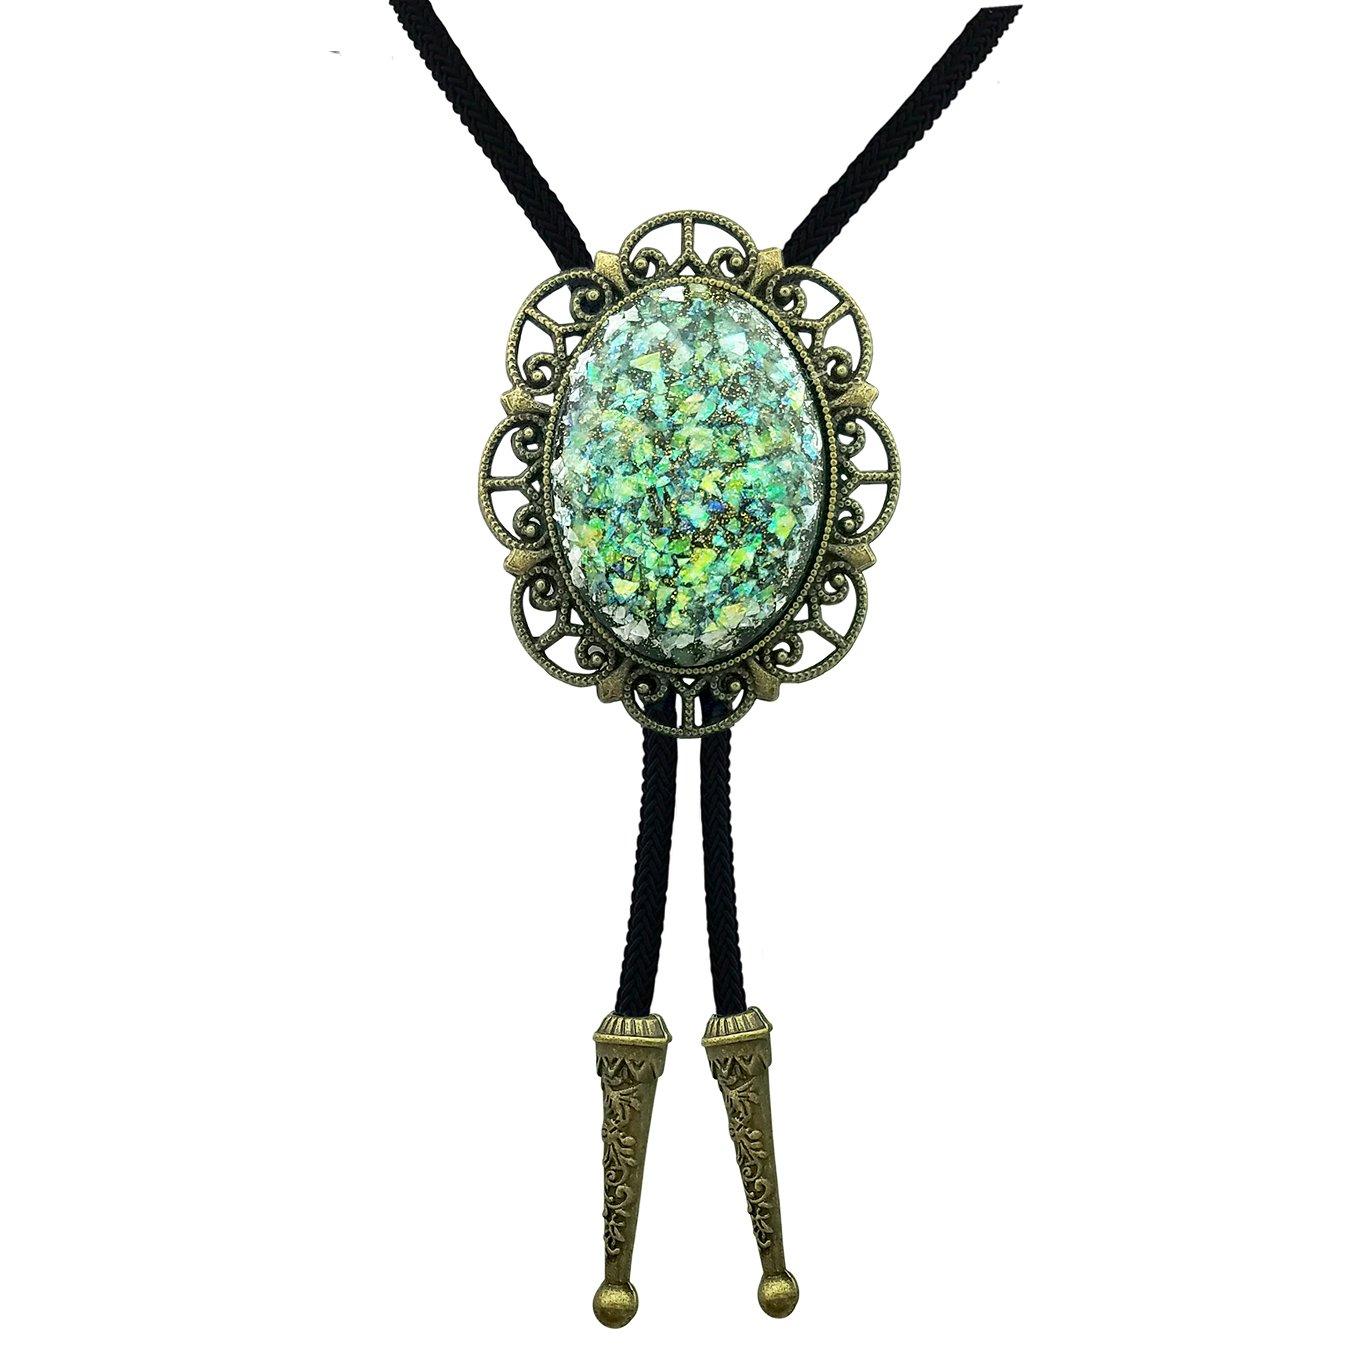 SELOVO Vintage Copper Tone Bolo Tie Nylon String Oval Shape Green Resin Stone